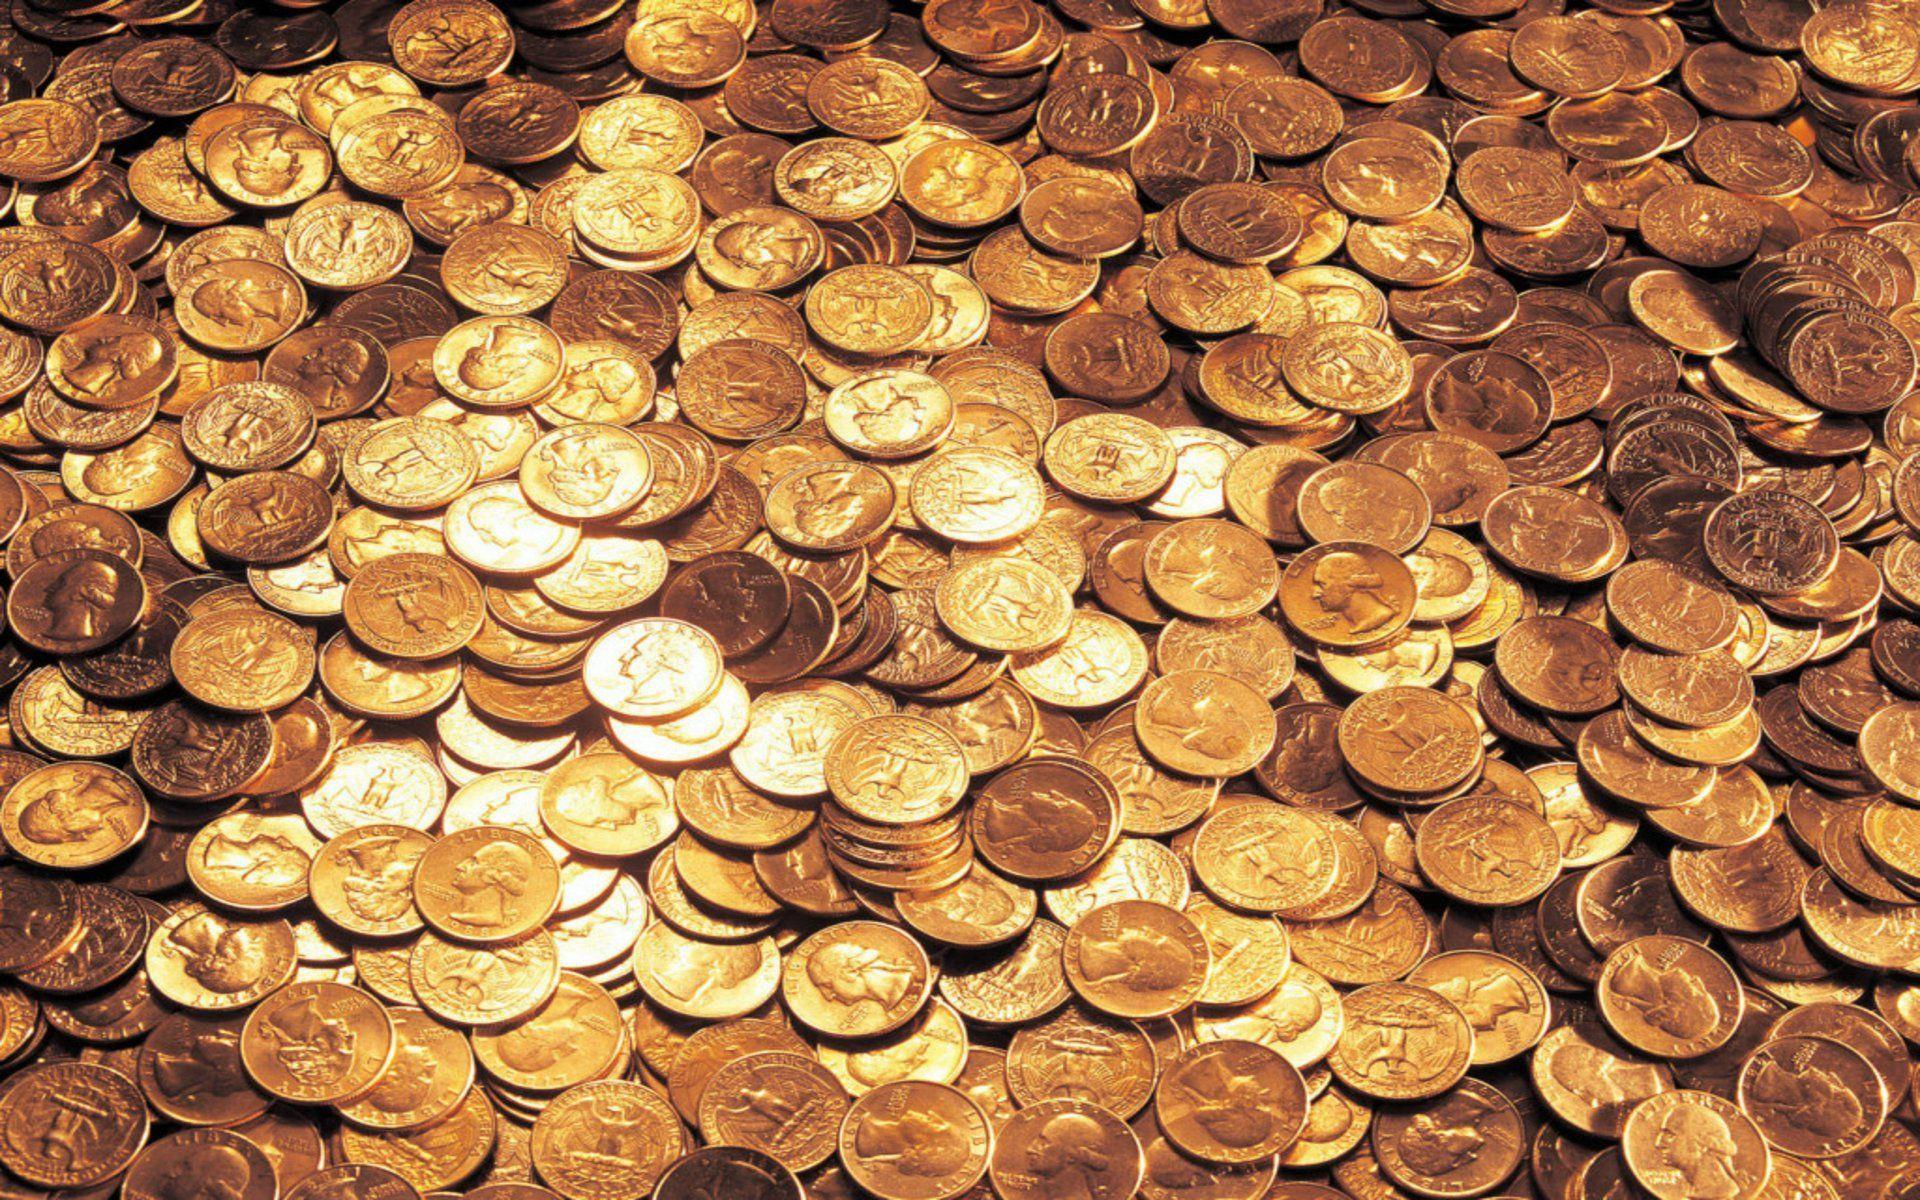 money-coins-money (2)